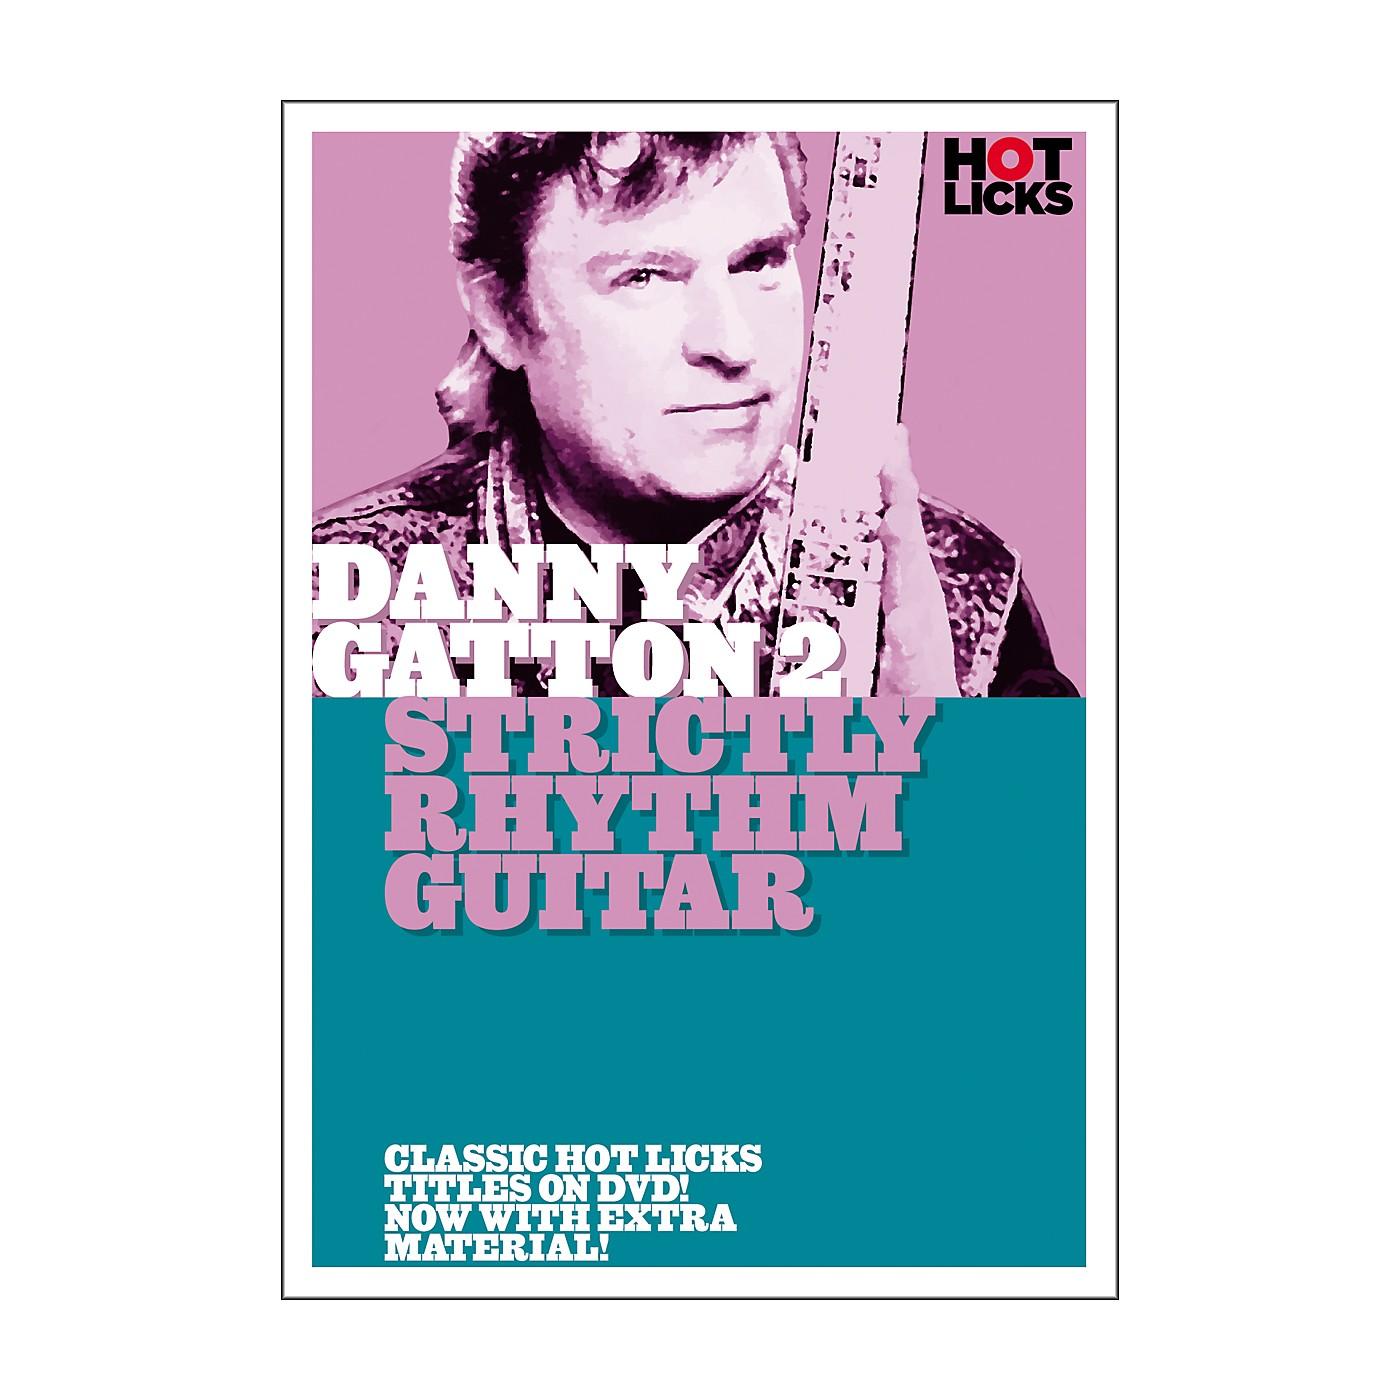 Hot Licks Danny Gatton 2 Strictly Rhythm Guitar (DVD) thumbnail